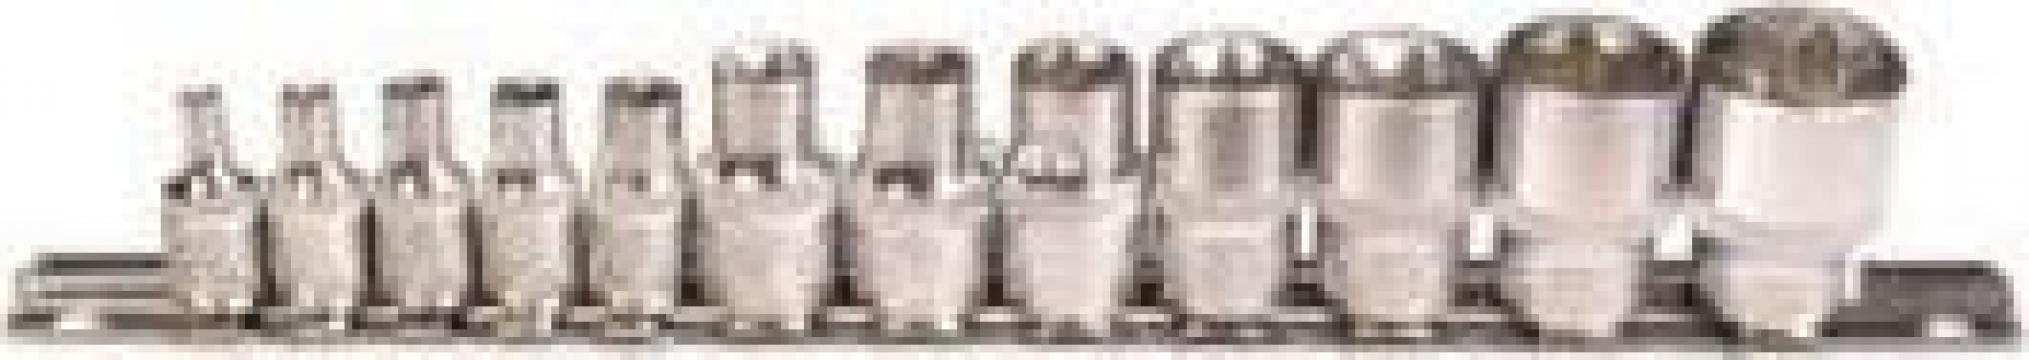 "Trusa tubulare 12 piese profil E, 1/4""+3/8"" - 2038"